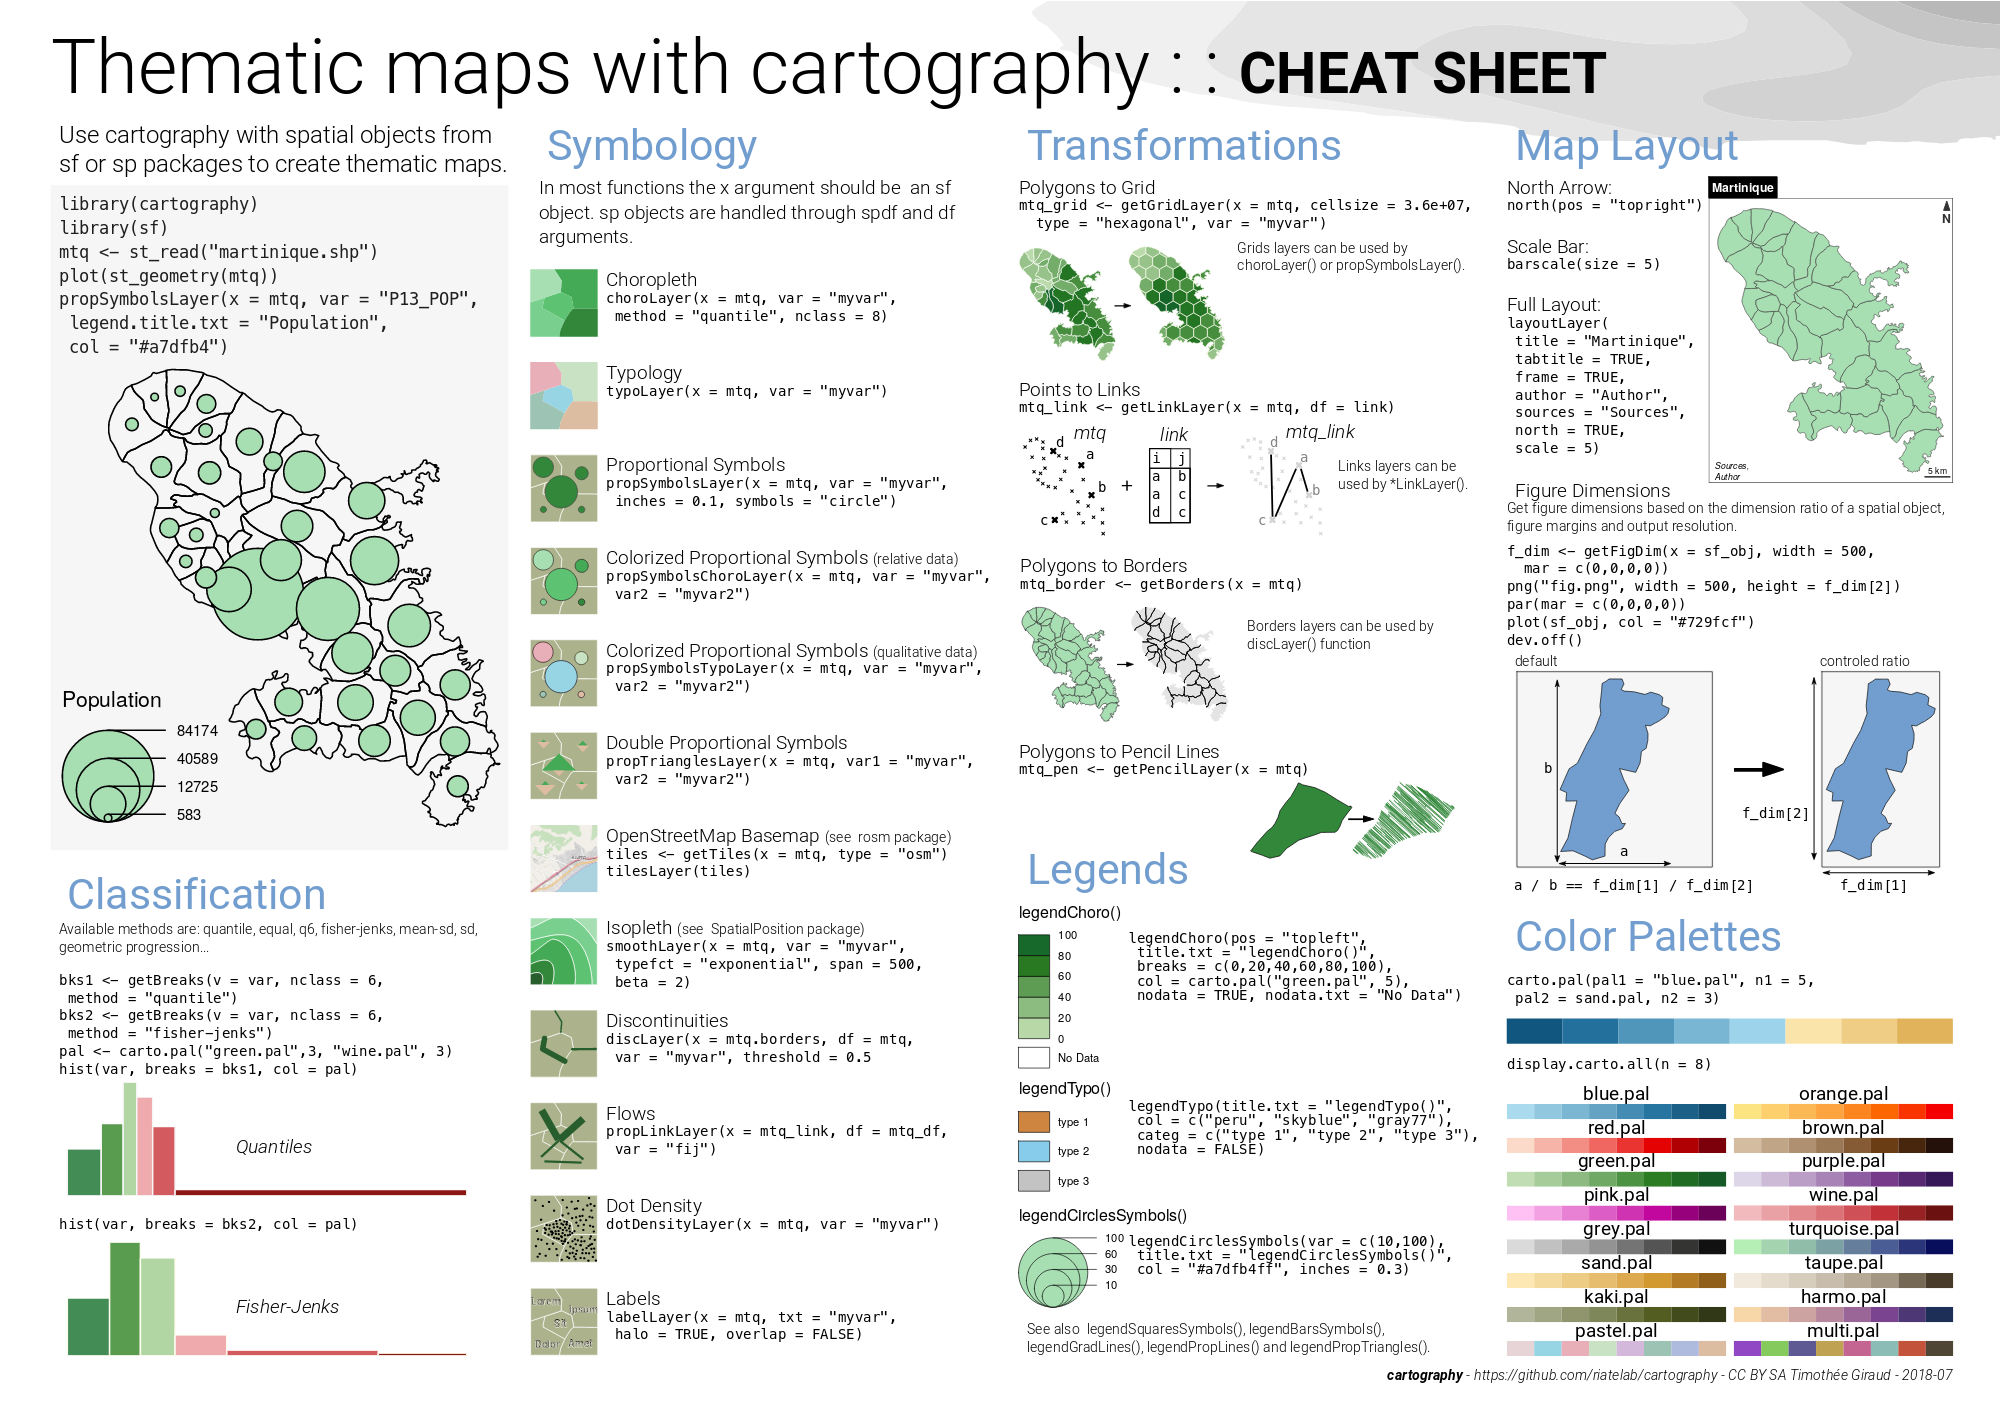 static/R-webinars/geospatial-data-presentation/images/cheat_sheet.png